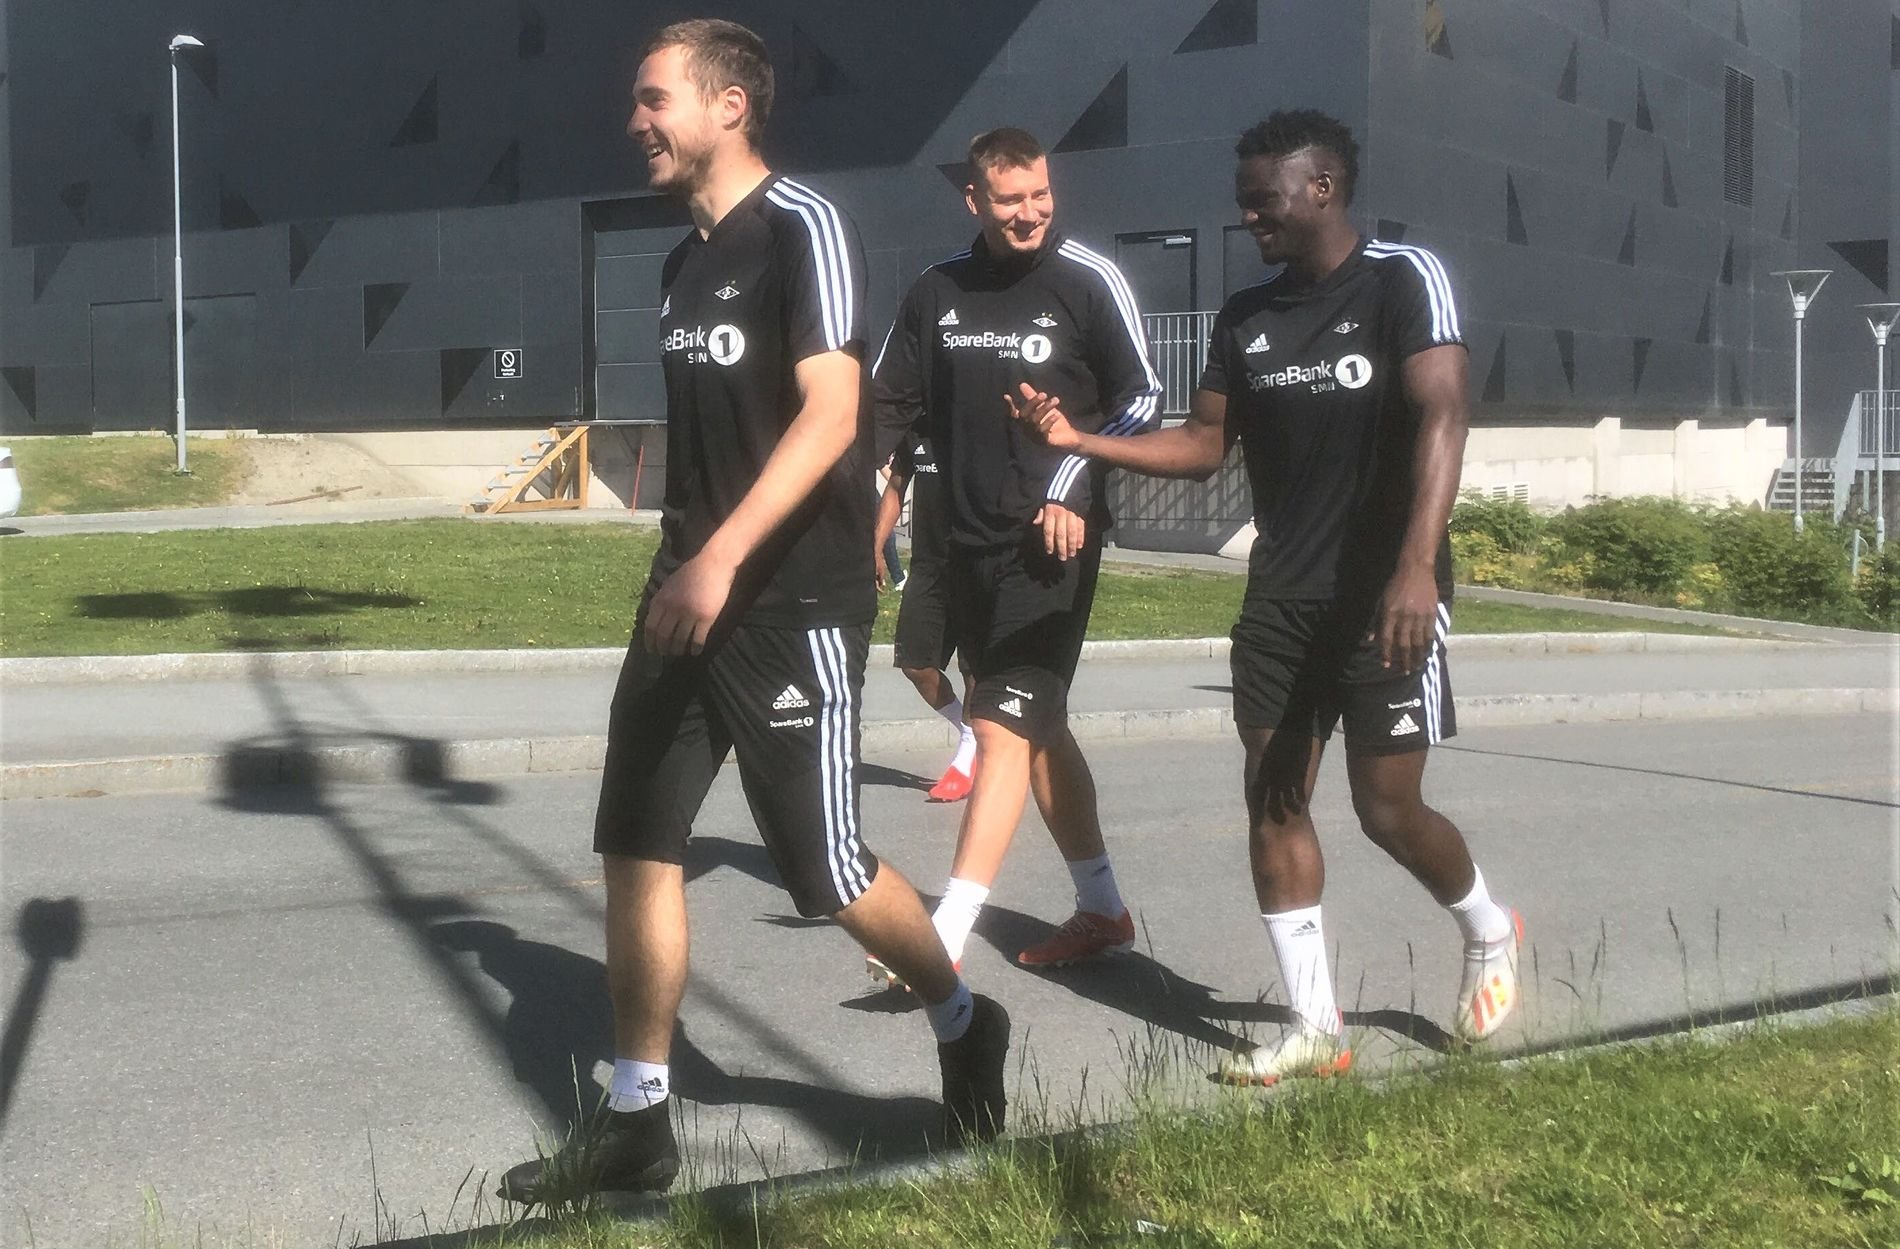 SMIL: Nicklas Bendtner var i godt humør da han ankom RBK-treningen sammen med Dorde Denic (t.v), Samuel Adegbenro (bak Bendtner) og David Akintola (t.h.) i formiddag.